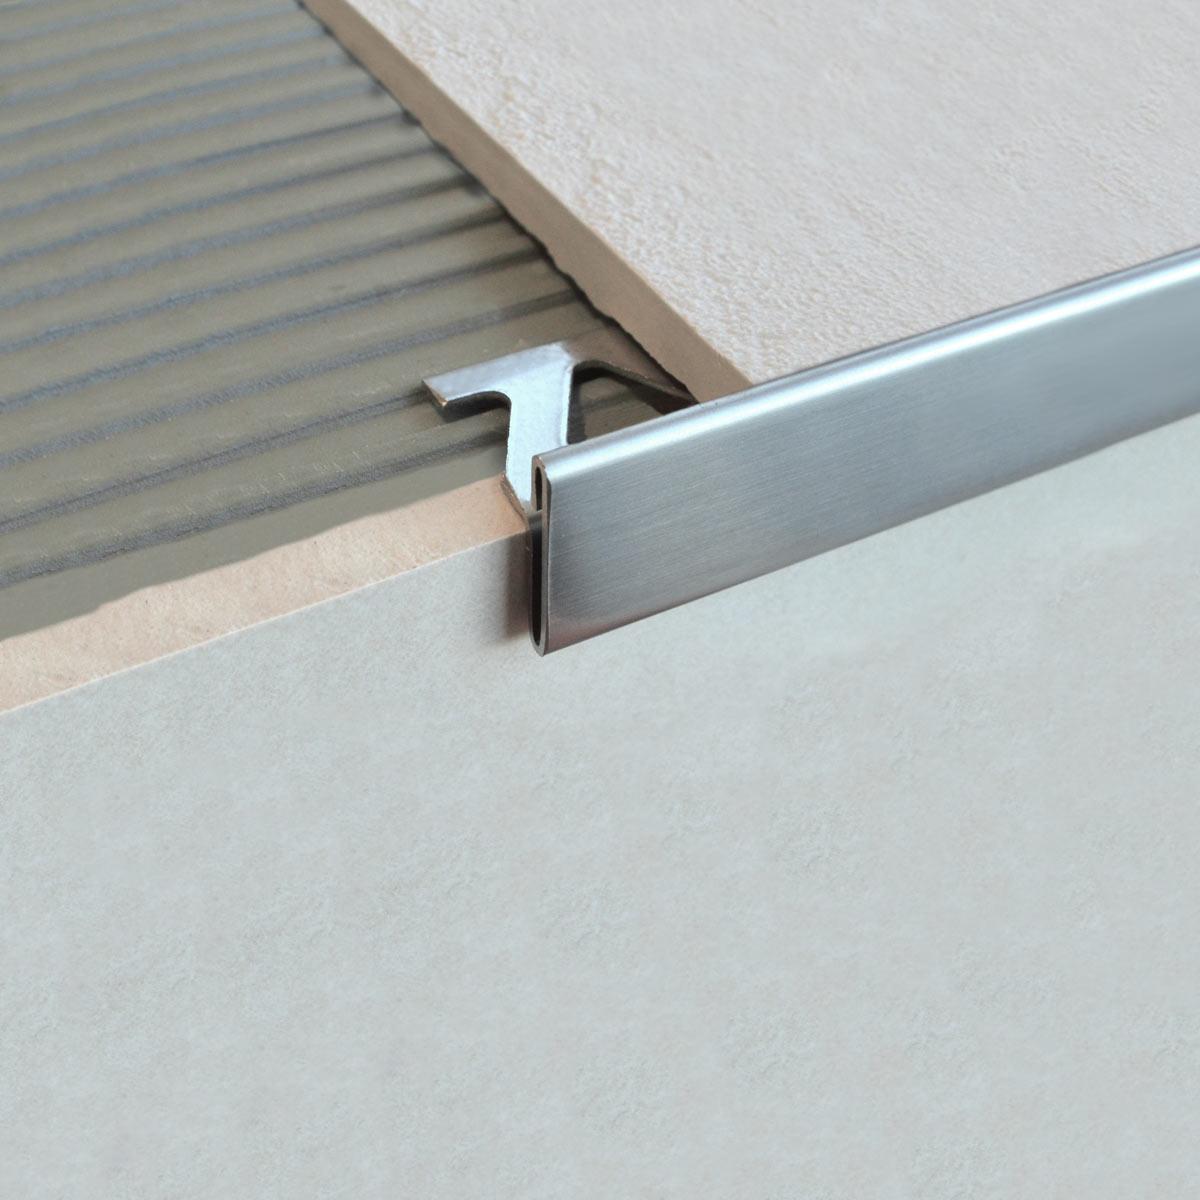 Profili per pavimenti Trimtec SR IS Profilitec